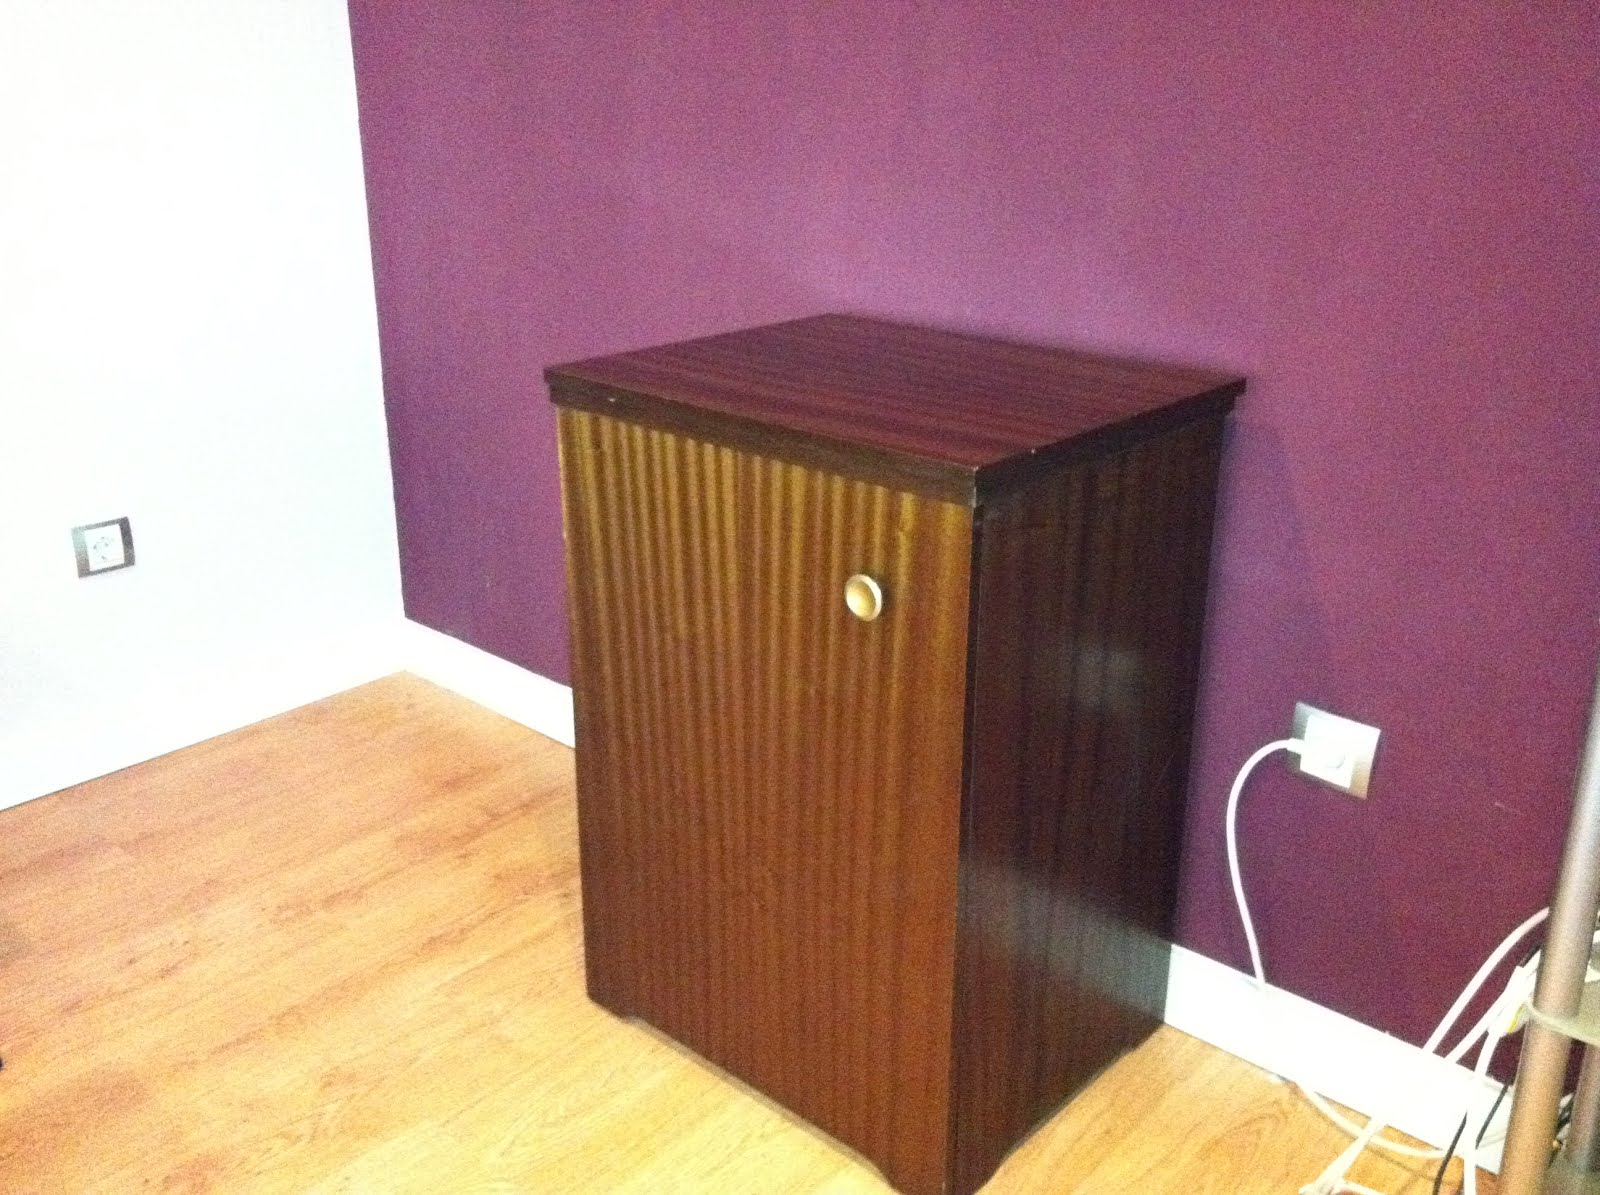 Muebles Maquina De Coser Elegant Mueble Para Mquina De Coser  # Muebles Maquina De Coser Segunda Mano